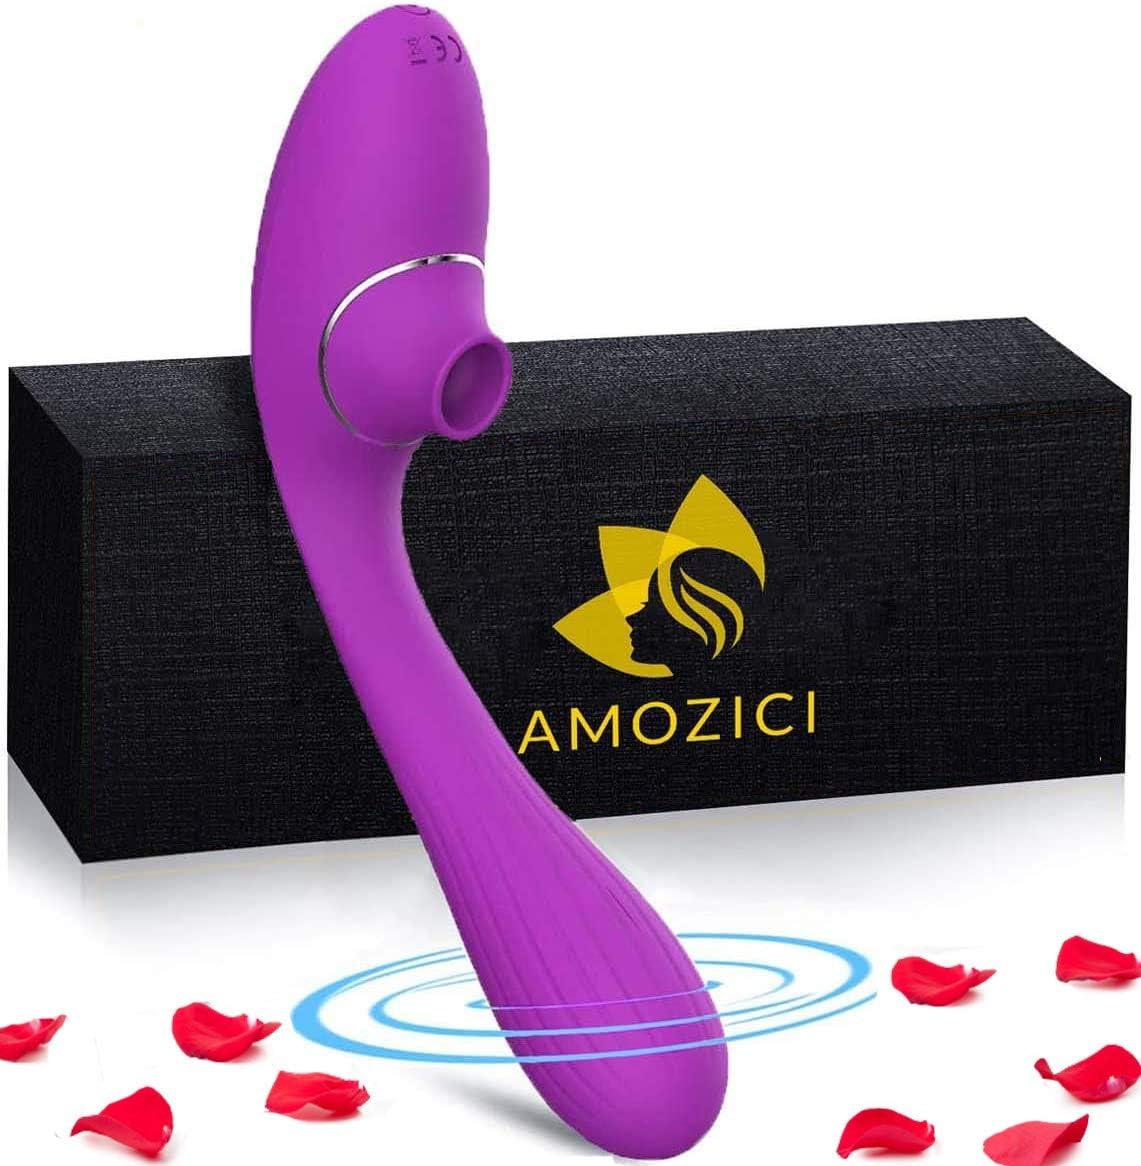 Helin Succionador de clitoris con vibración punto G 10 MODOS